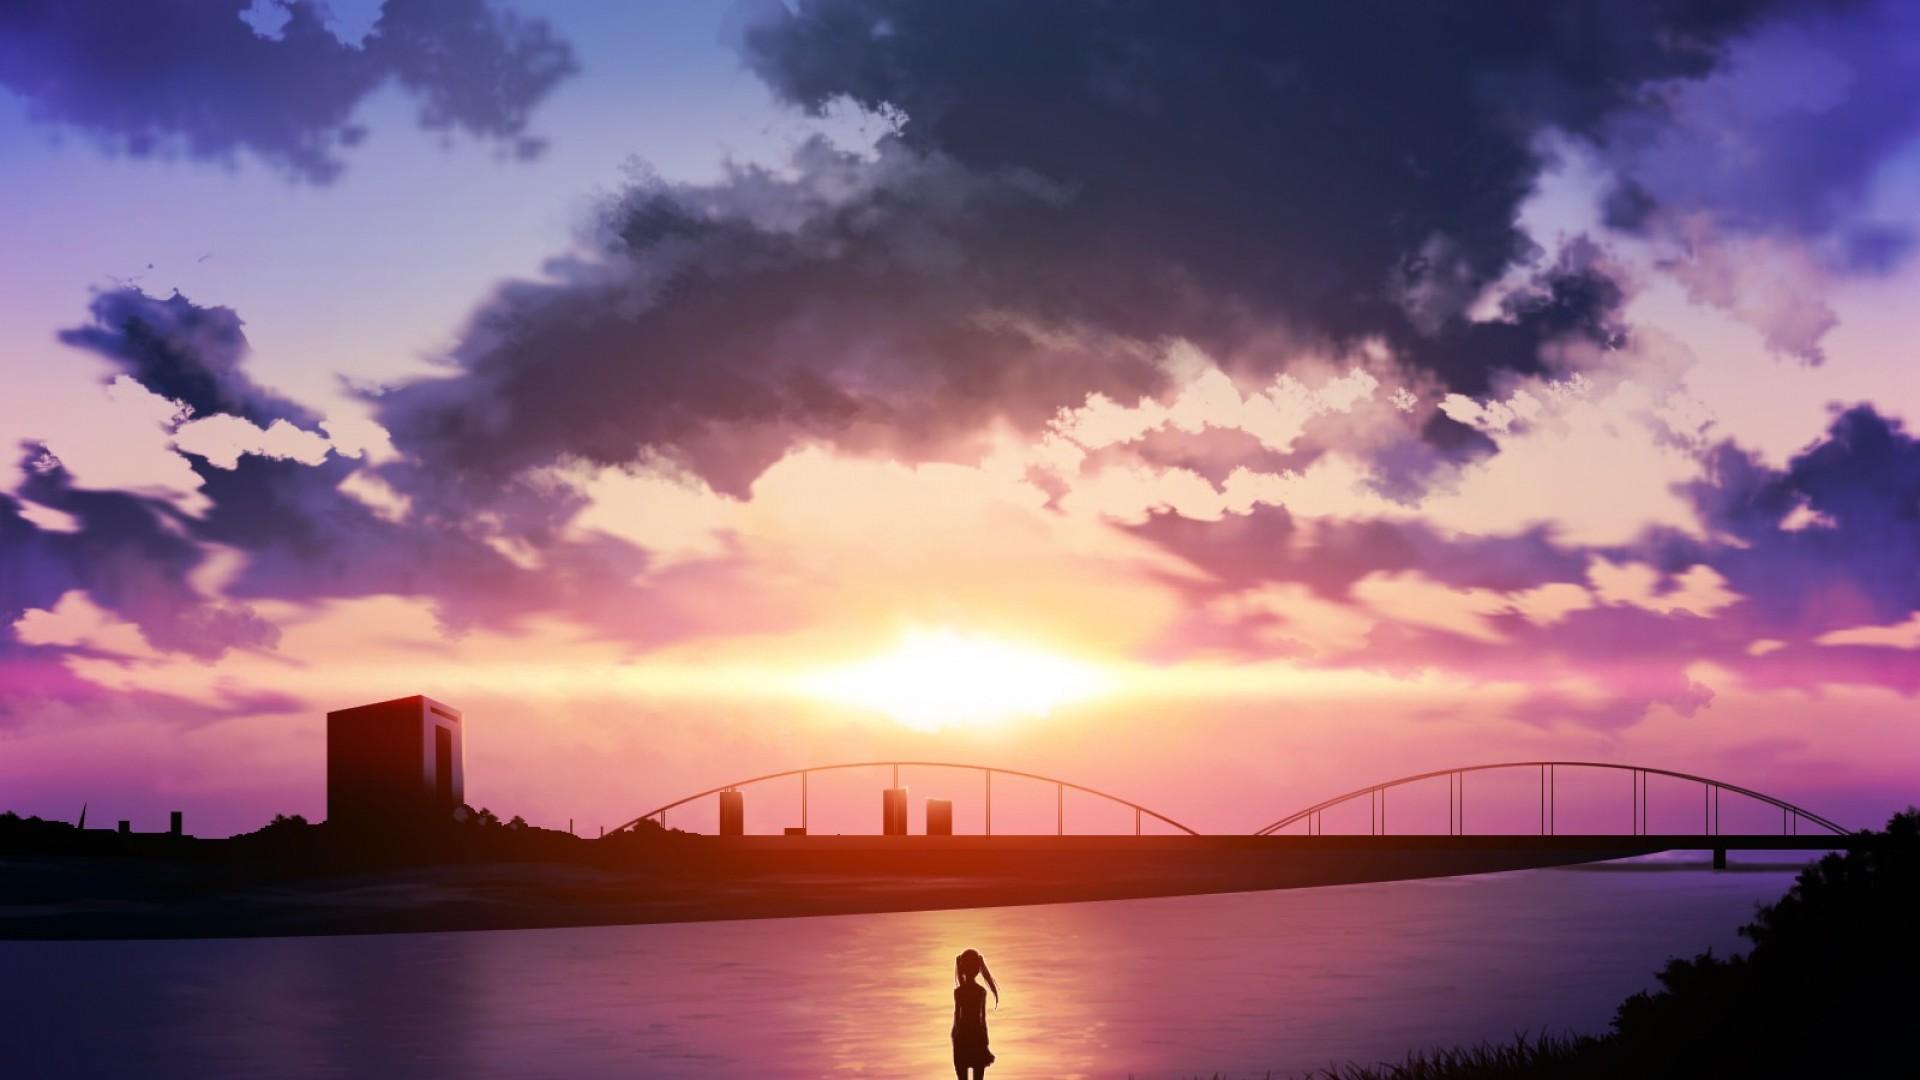 image sunset anime scenery wallpaper brothers. Black Bedroom Furniture Sets. Home Design Ideas